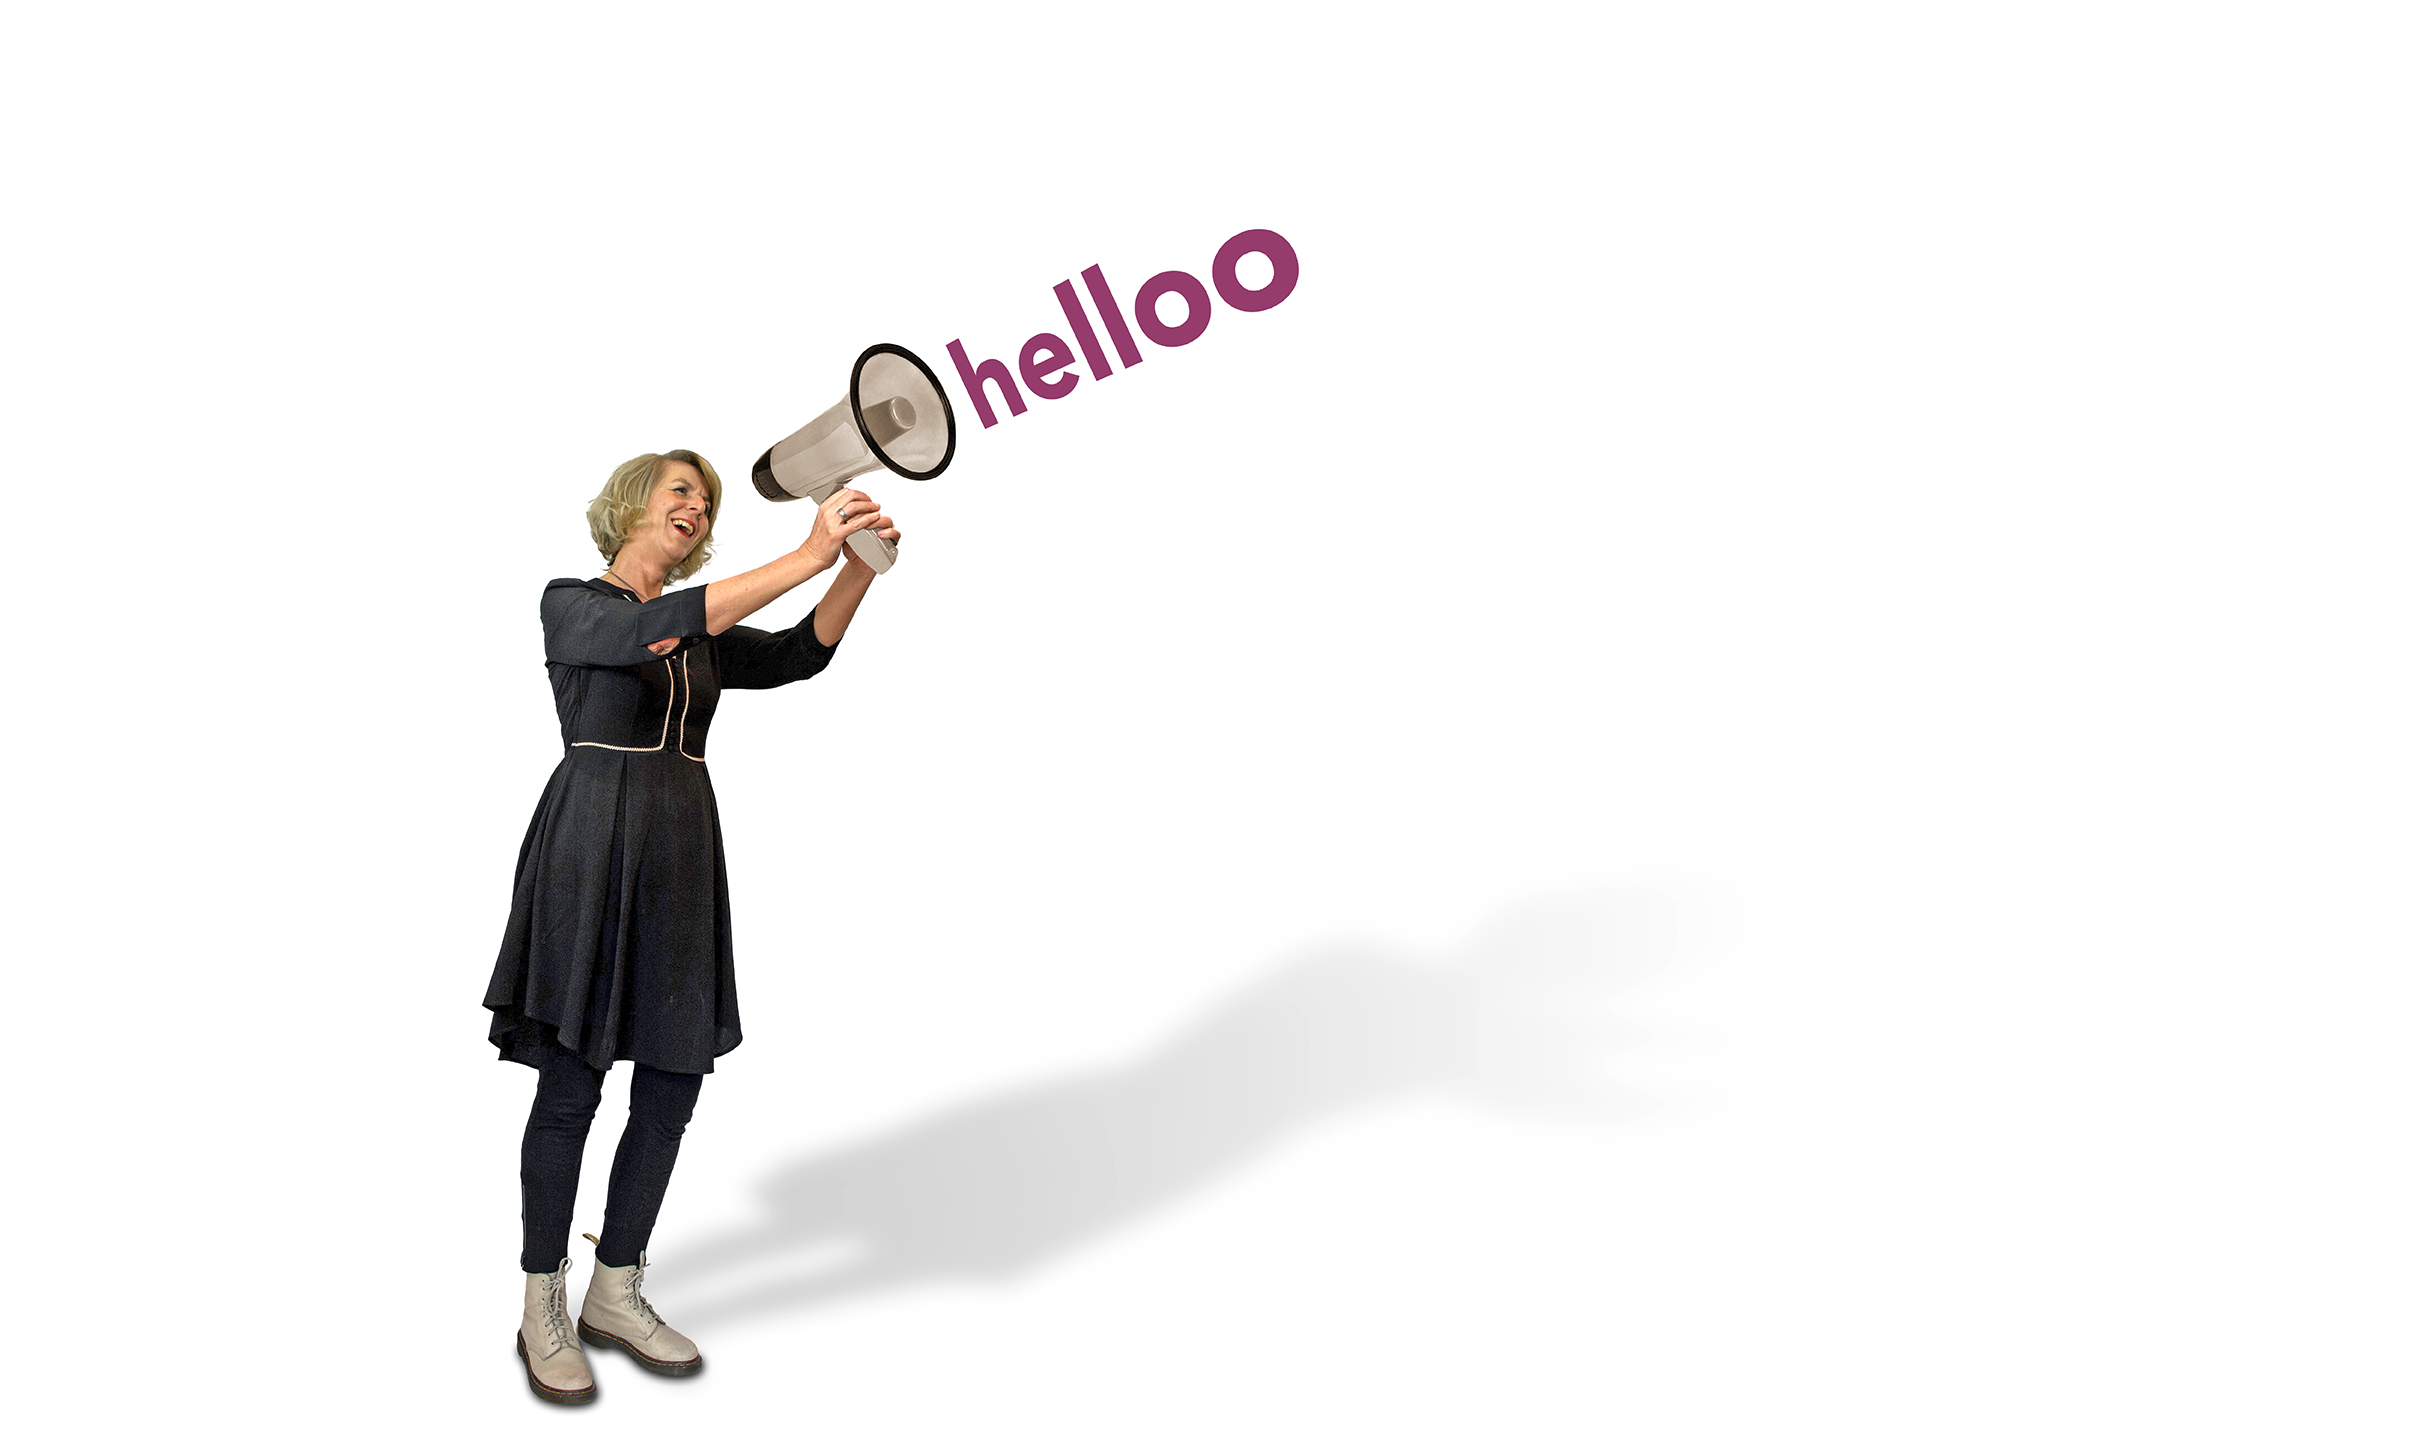 Hello_helloo